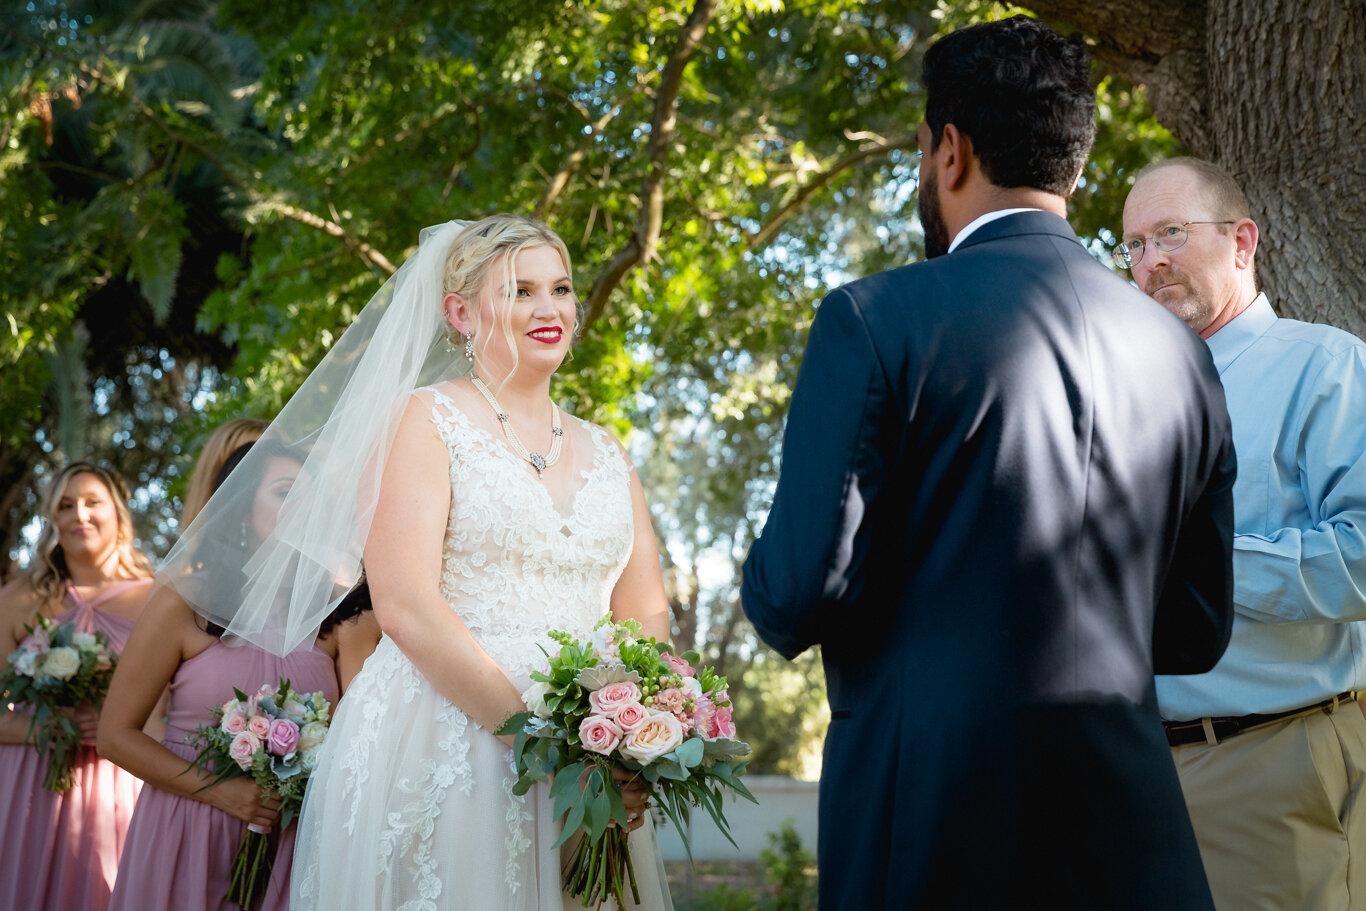 2019.08.24_Emily-Ashir-Wedding-at-the-Maples-5863.jpg